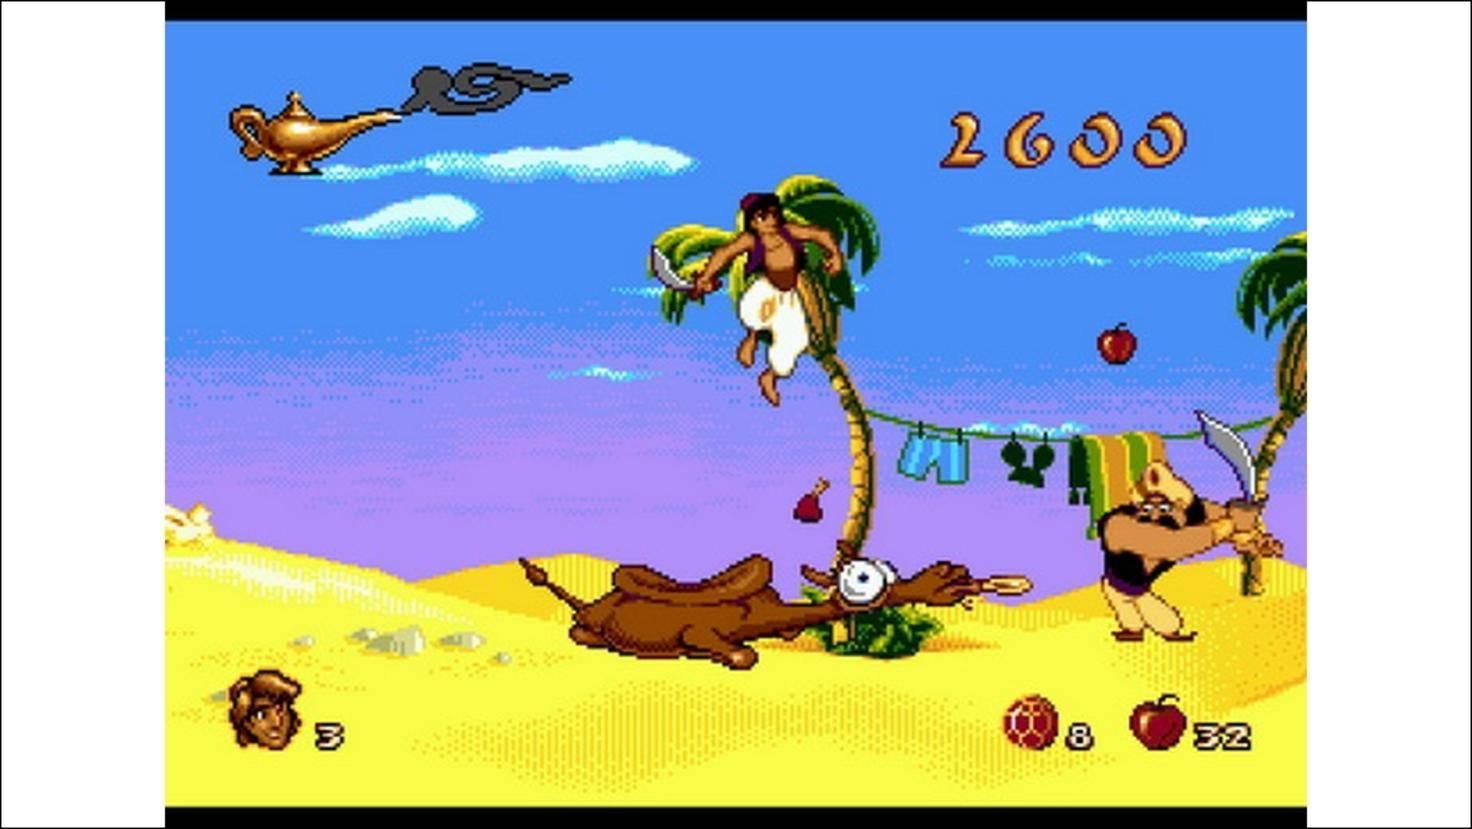 Aladdin-Sega-Mega-Drive-Disney